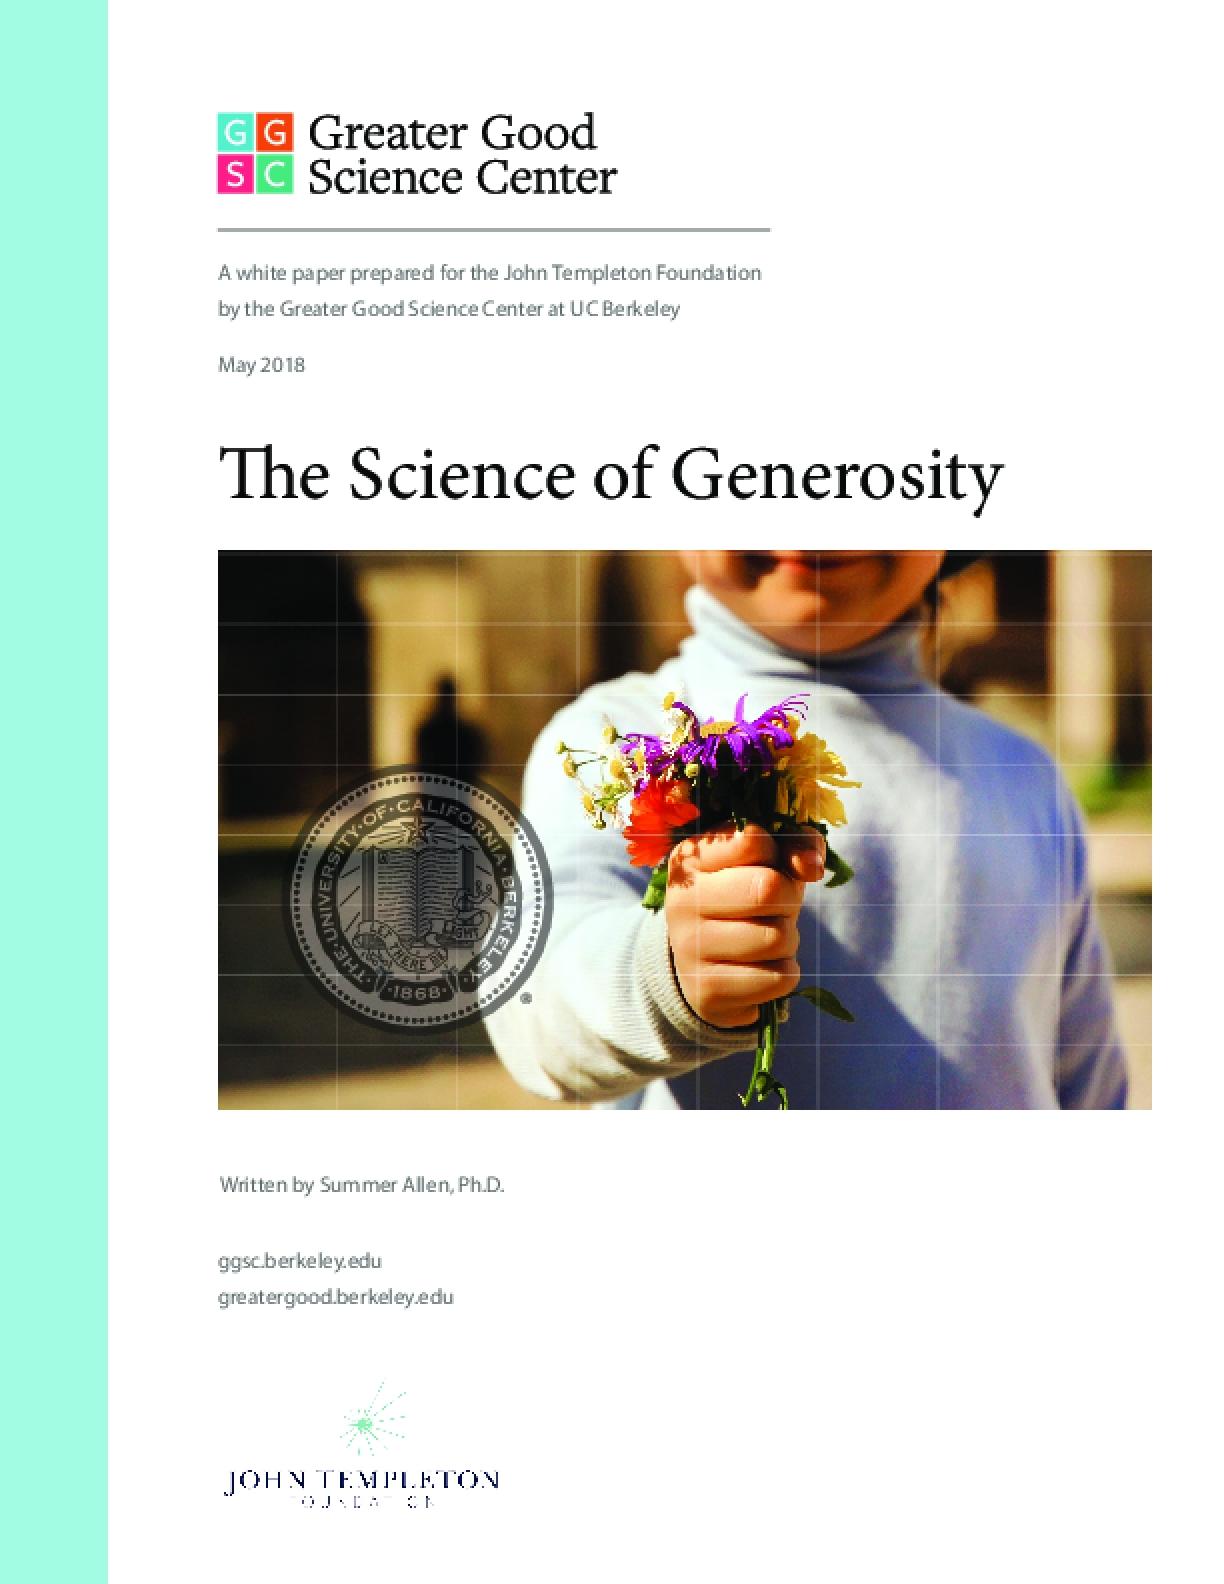 The Science of Generosity